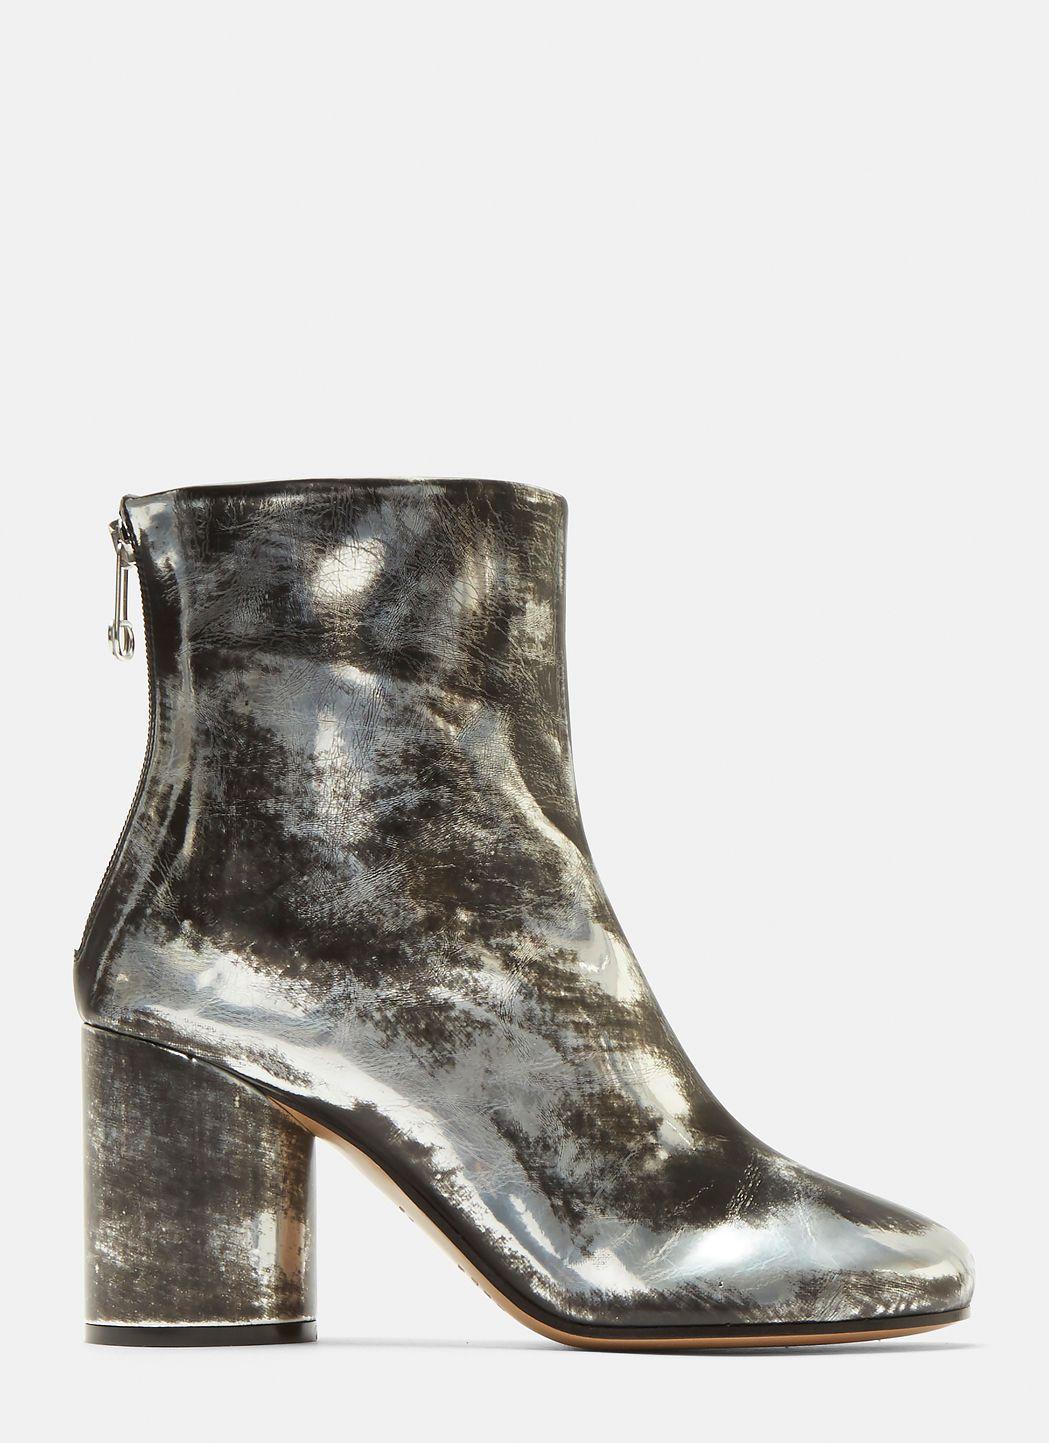 Maison Margiela Distressed Metallic Ankle Boots Best-seller À Vendre 2pBTh6Y0MX